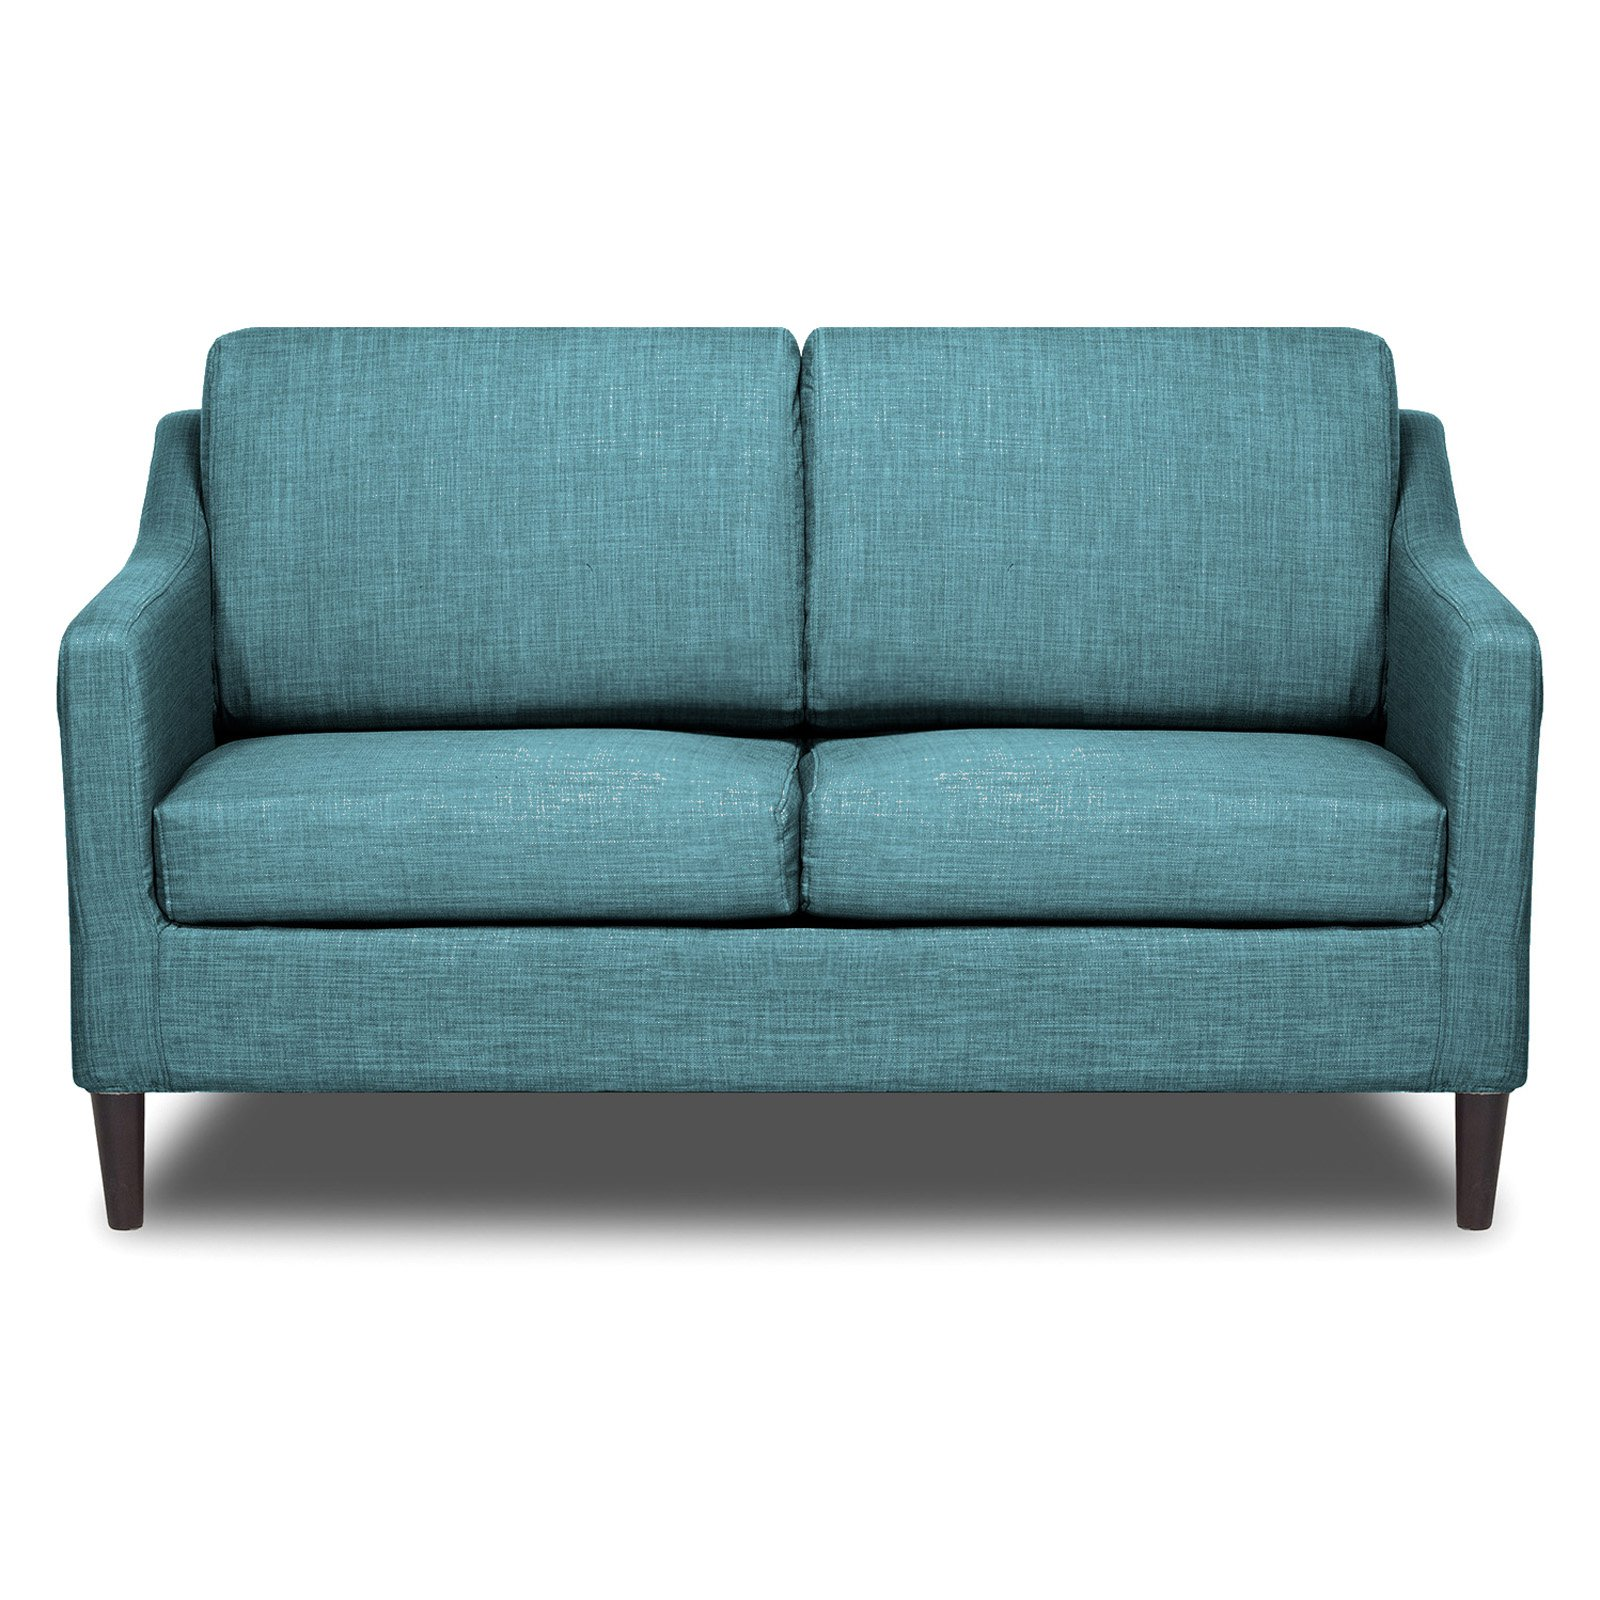 Dwell Home Sofa 2 Go Decker Loveseat